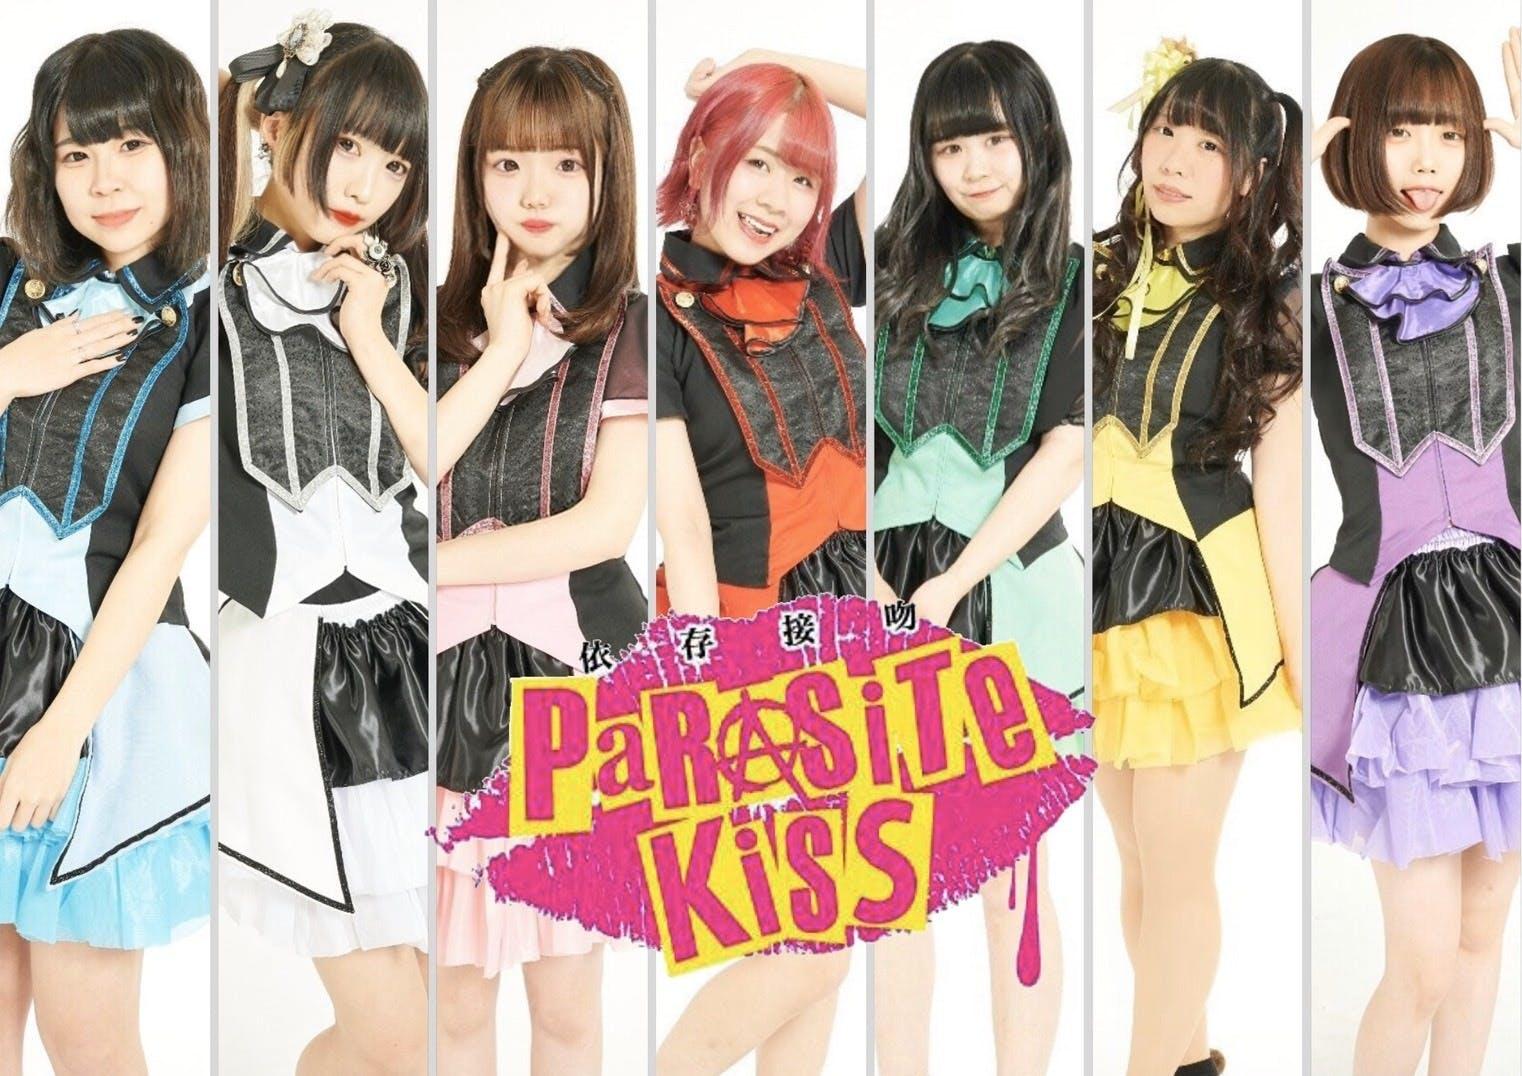 Parasite.Kiss